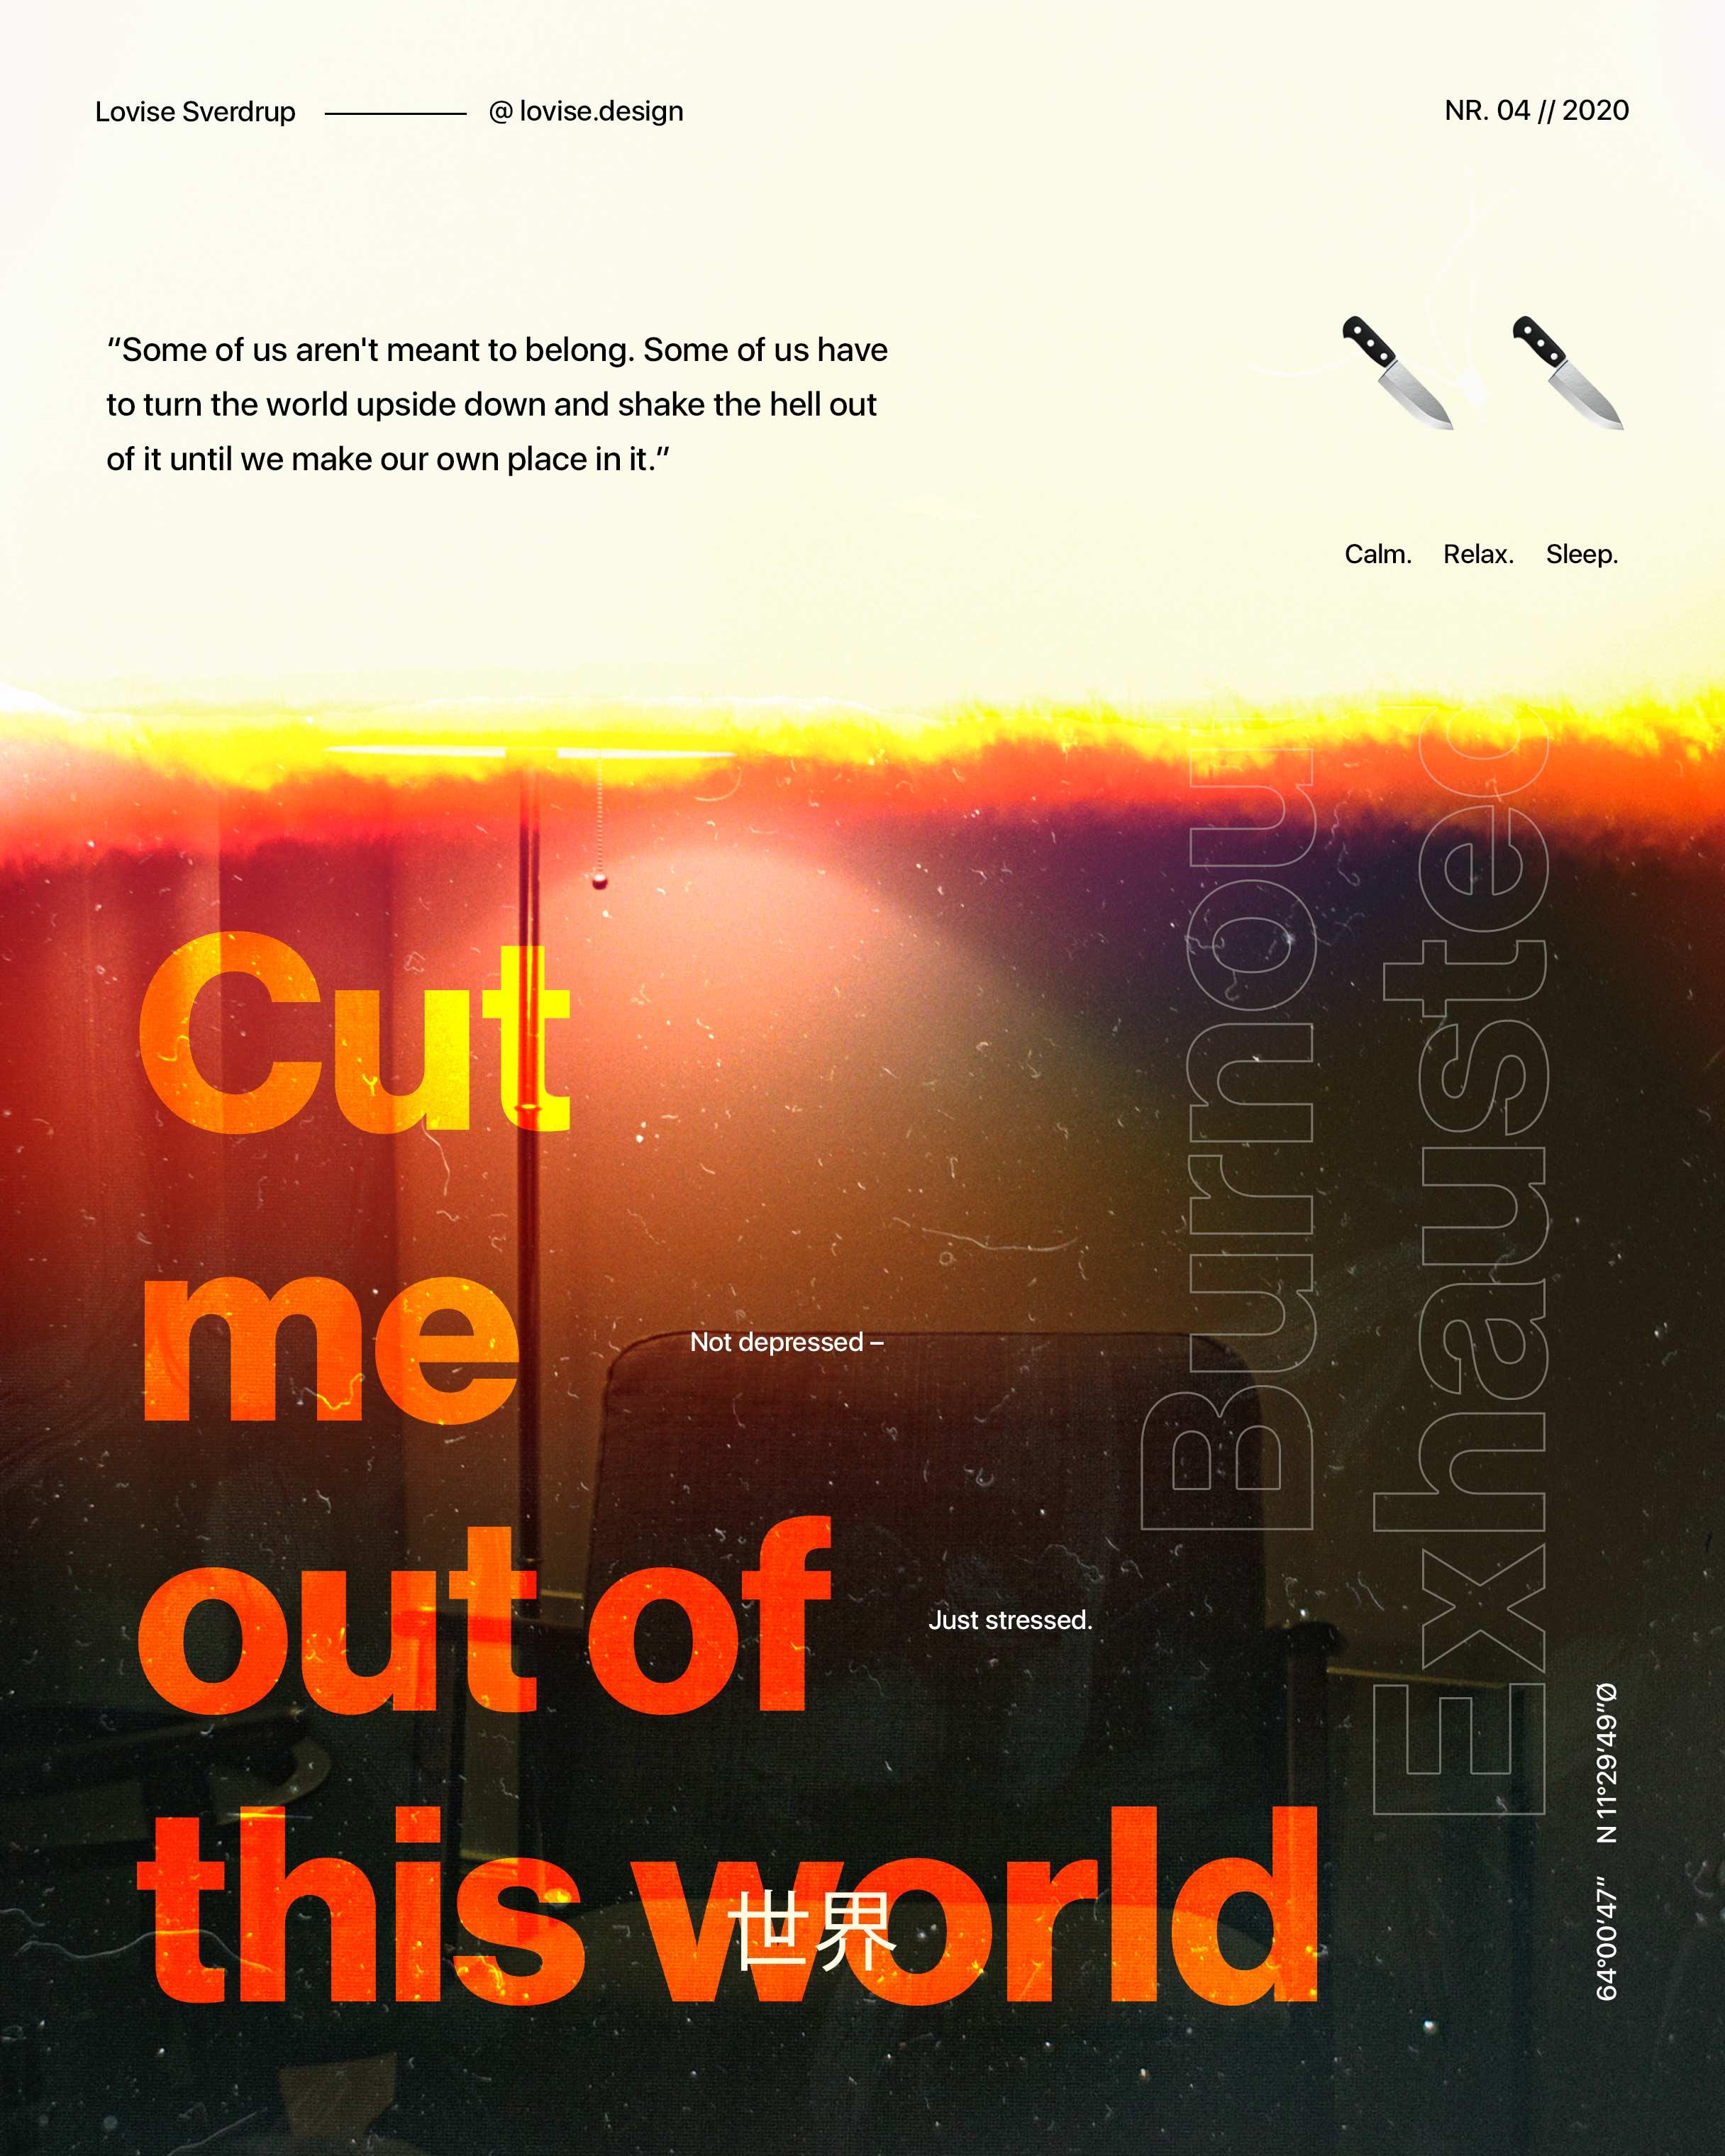 04-Cutmeoutofthisworld